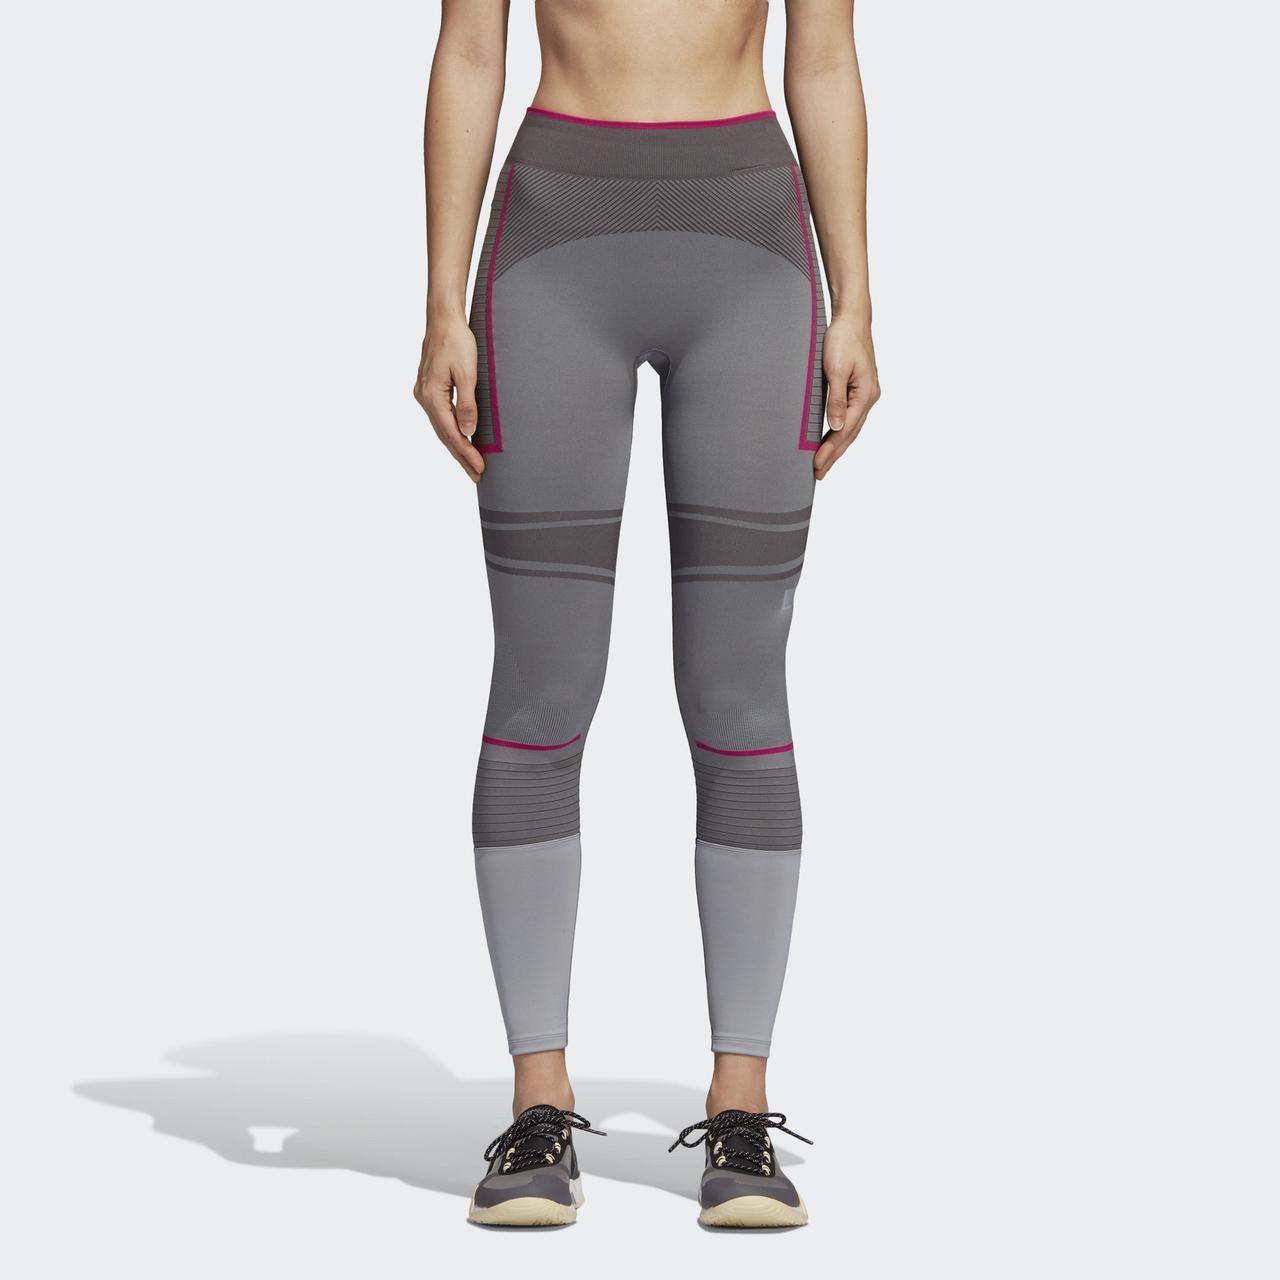 9f715030c4109 Женские леггинсы Adidas By Stella McCartney Training Seamless (Артикул:  DM7604)